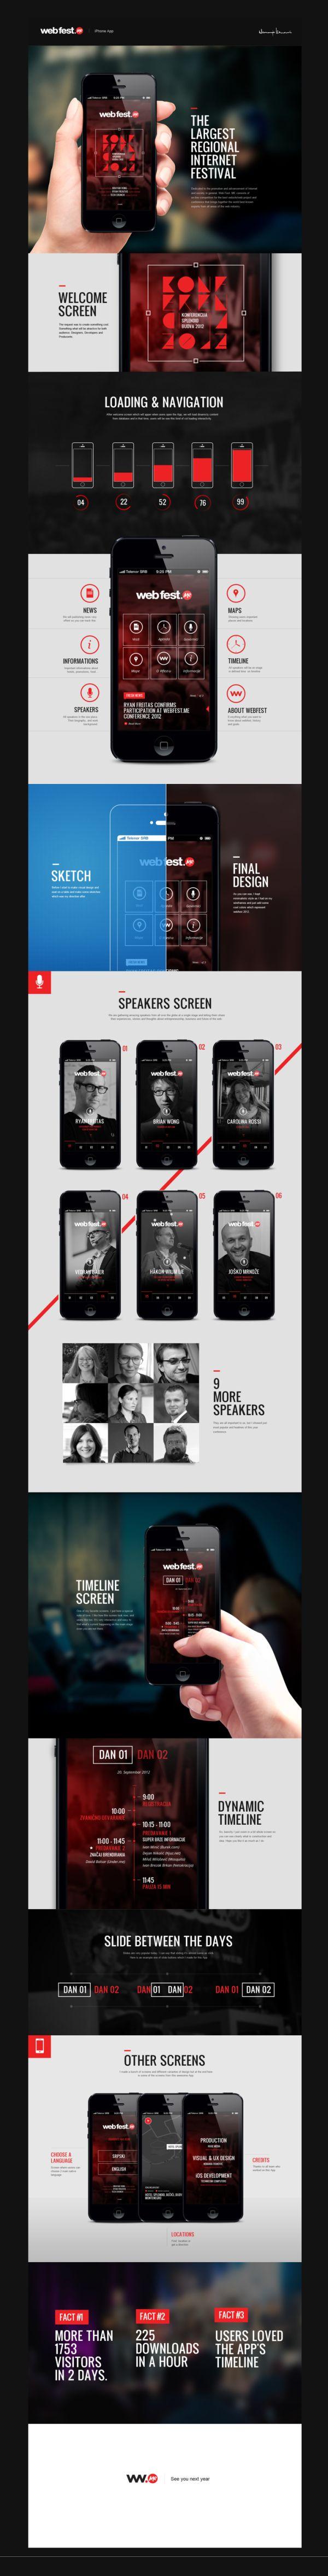 WebFest - #iPhone #App by Nemanja Ivanovic, via #Behance #UI #Mobile